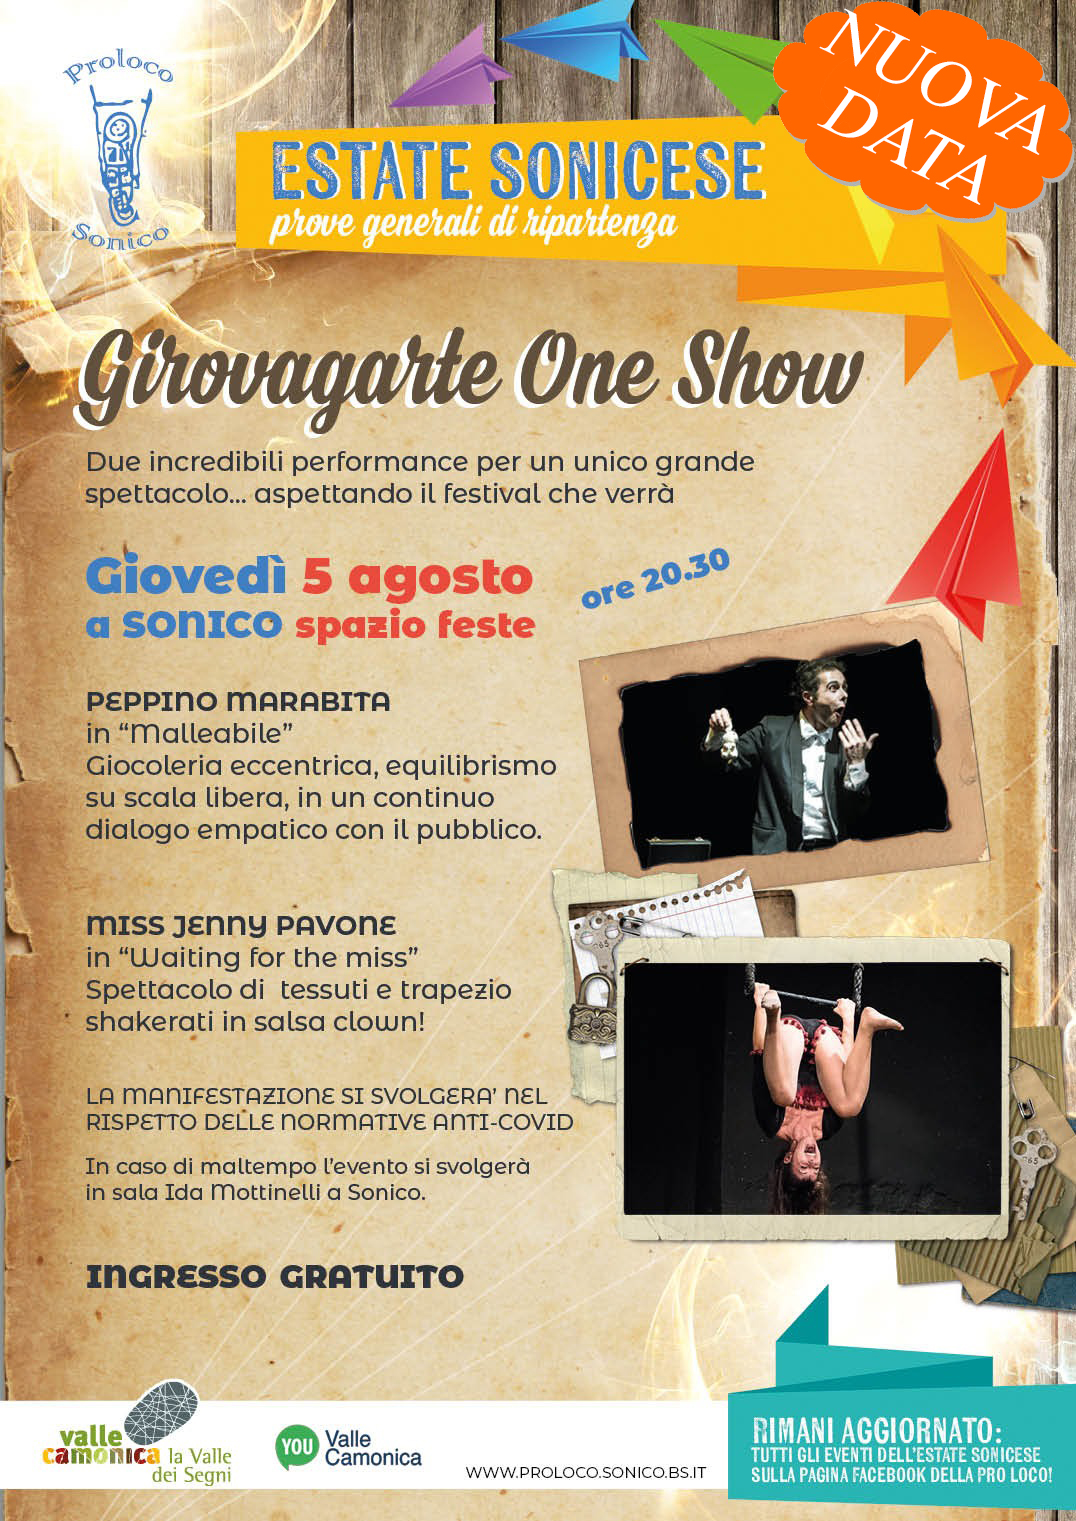 GirovagArte